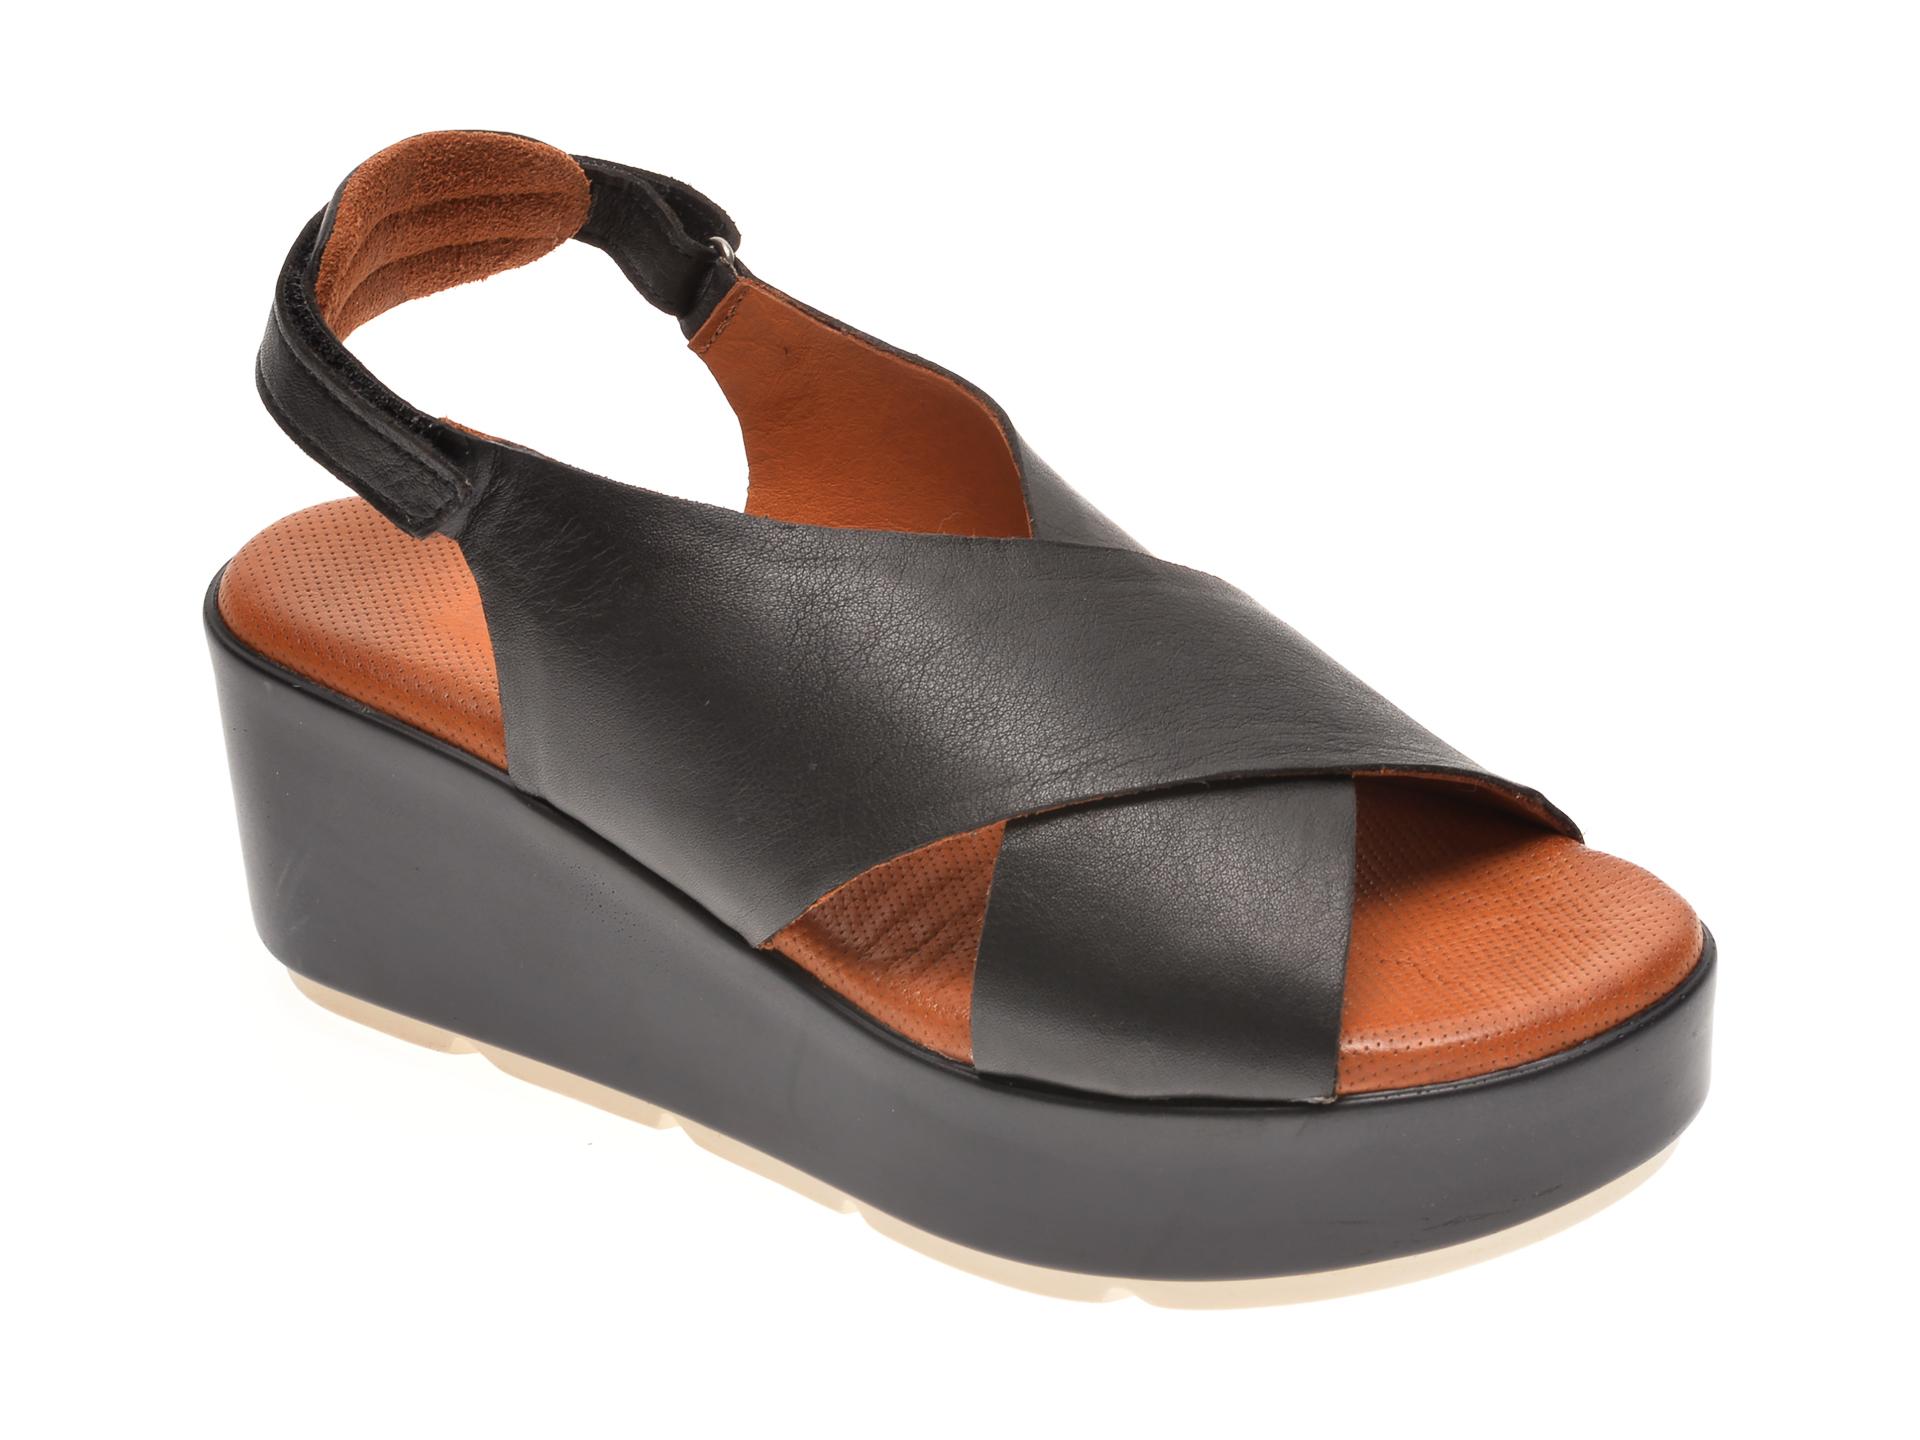 Sandale BABOOS negre, 2520, din piele naturala